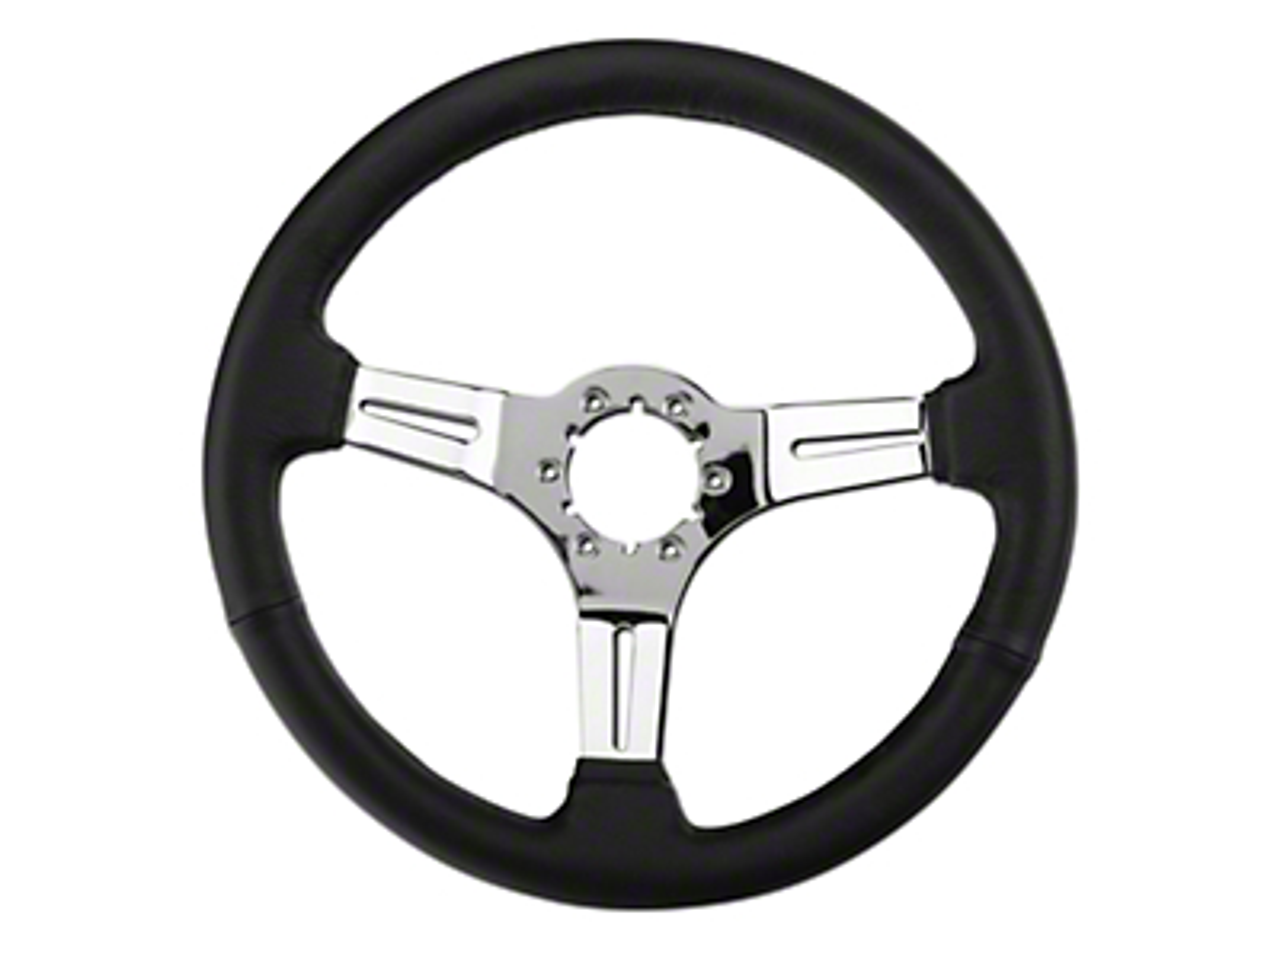 Alterum Black Leather Steering Wheel (79-04 All)